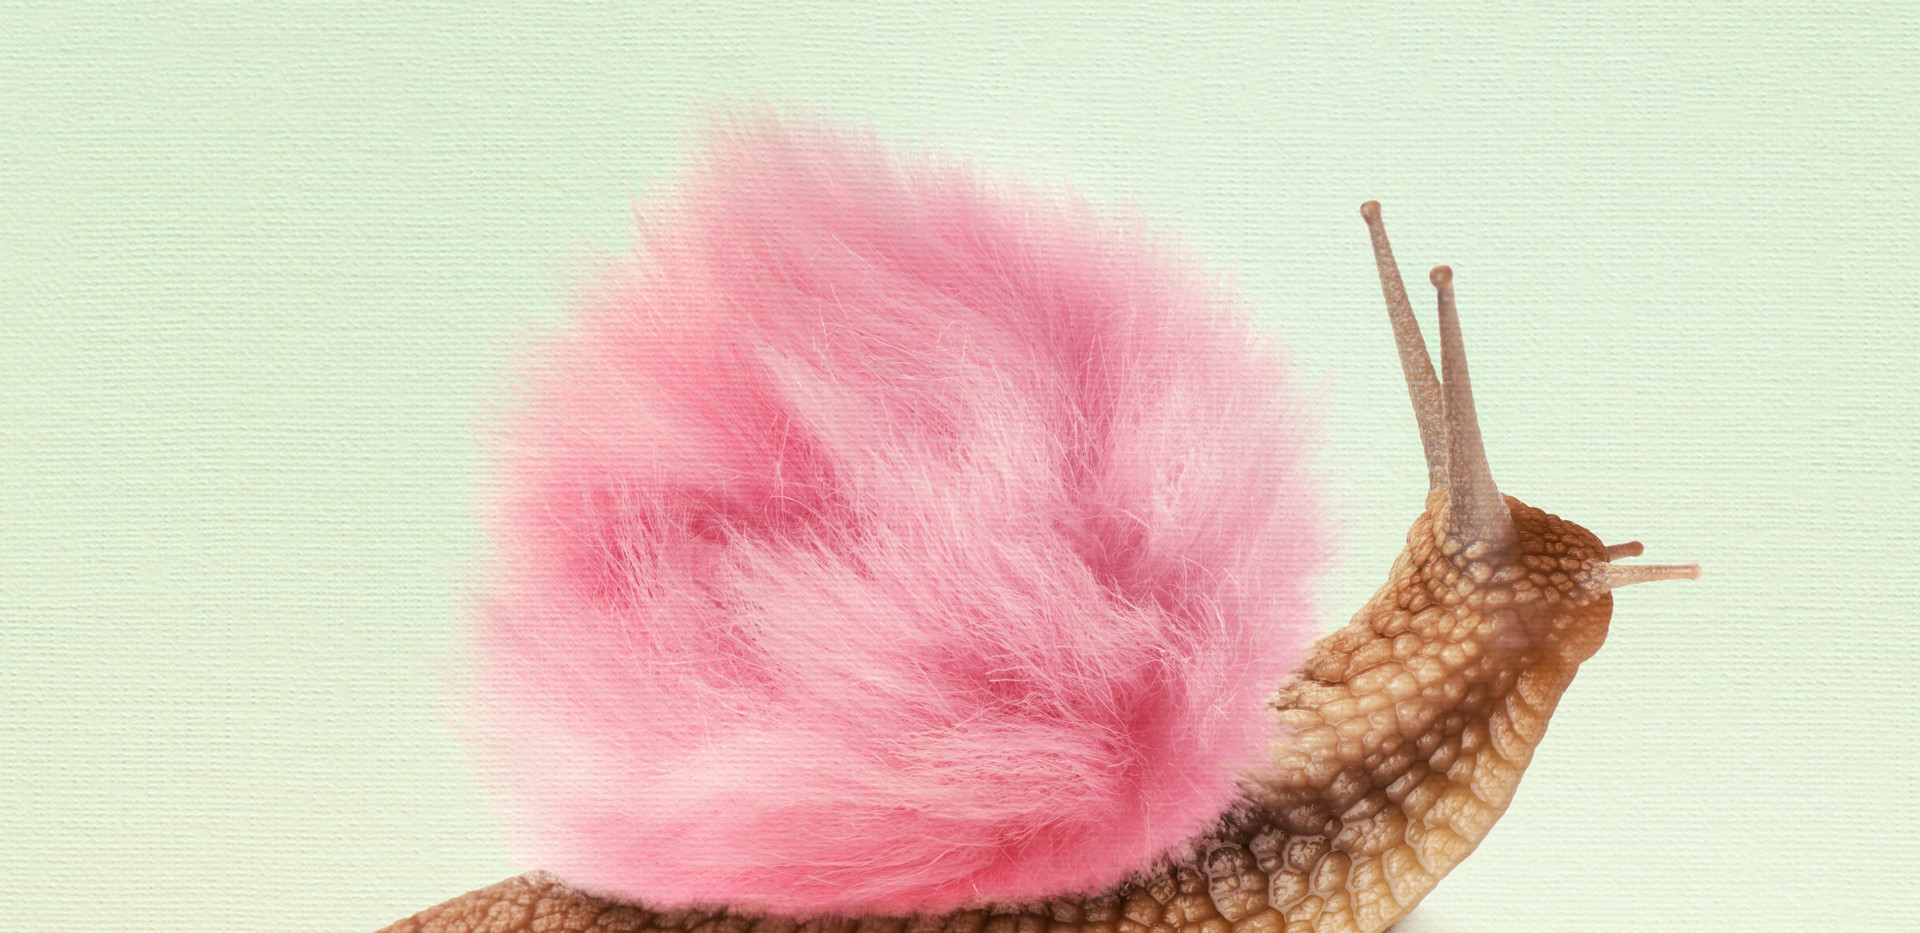 Fluffy snail.jpg